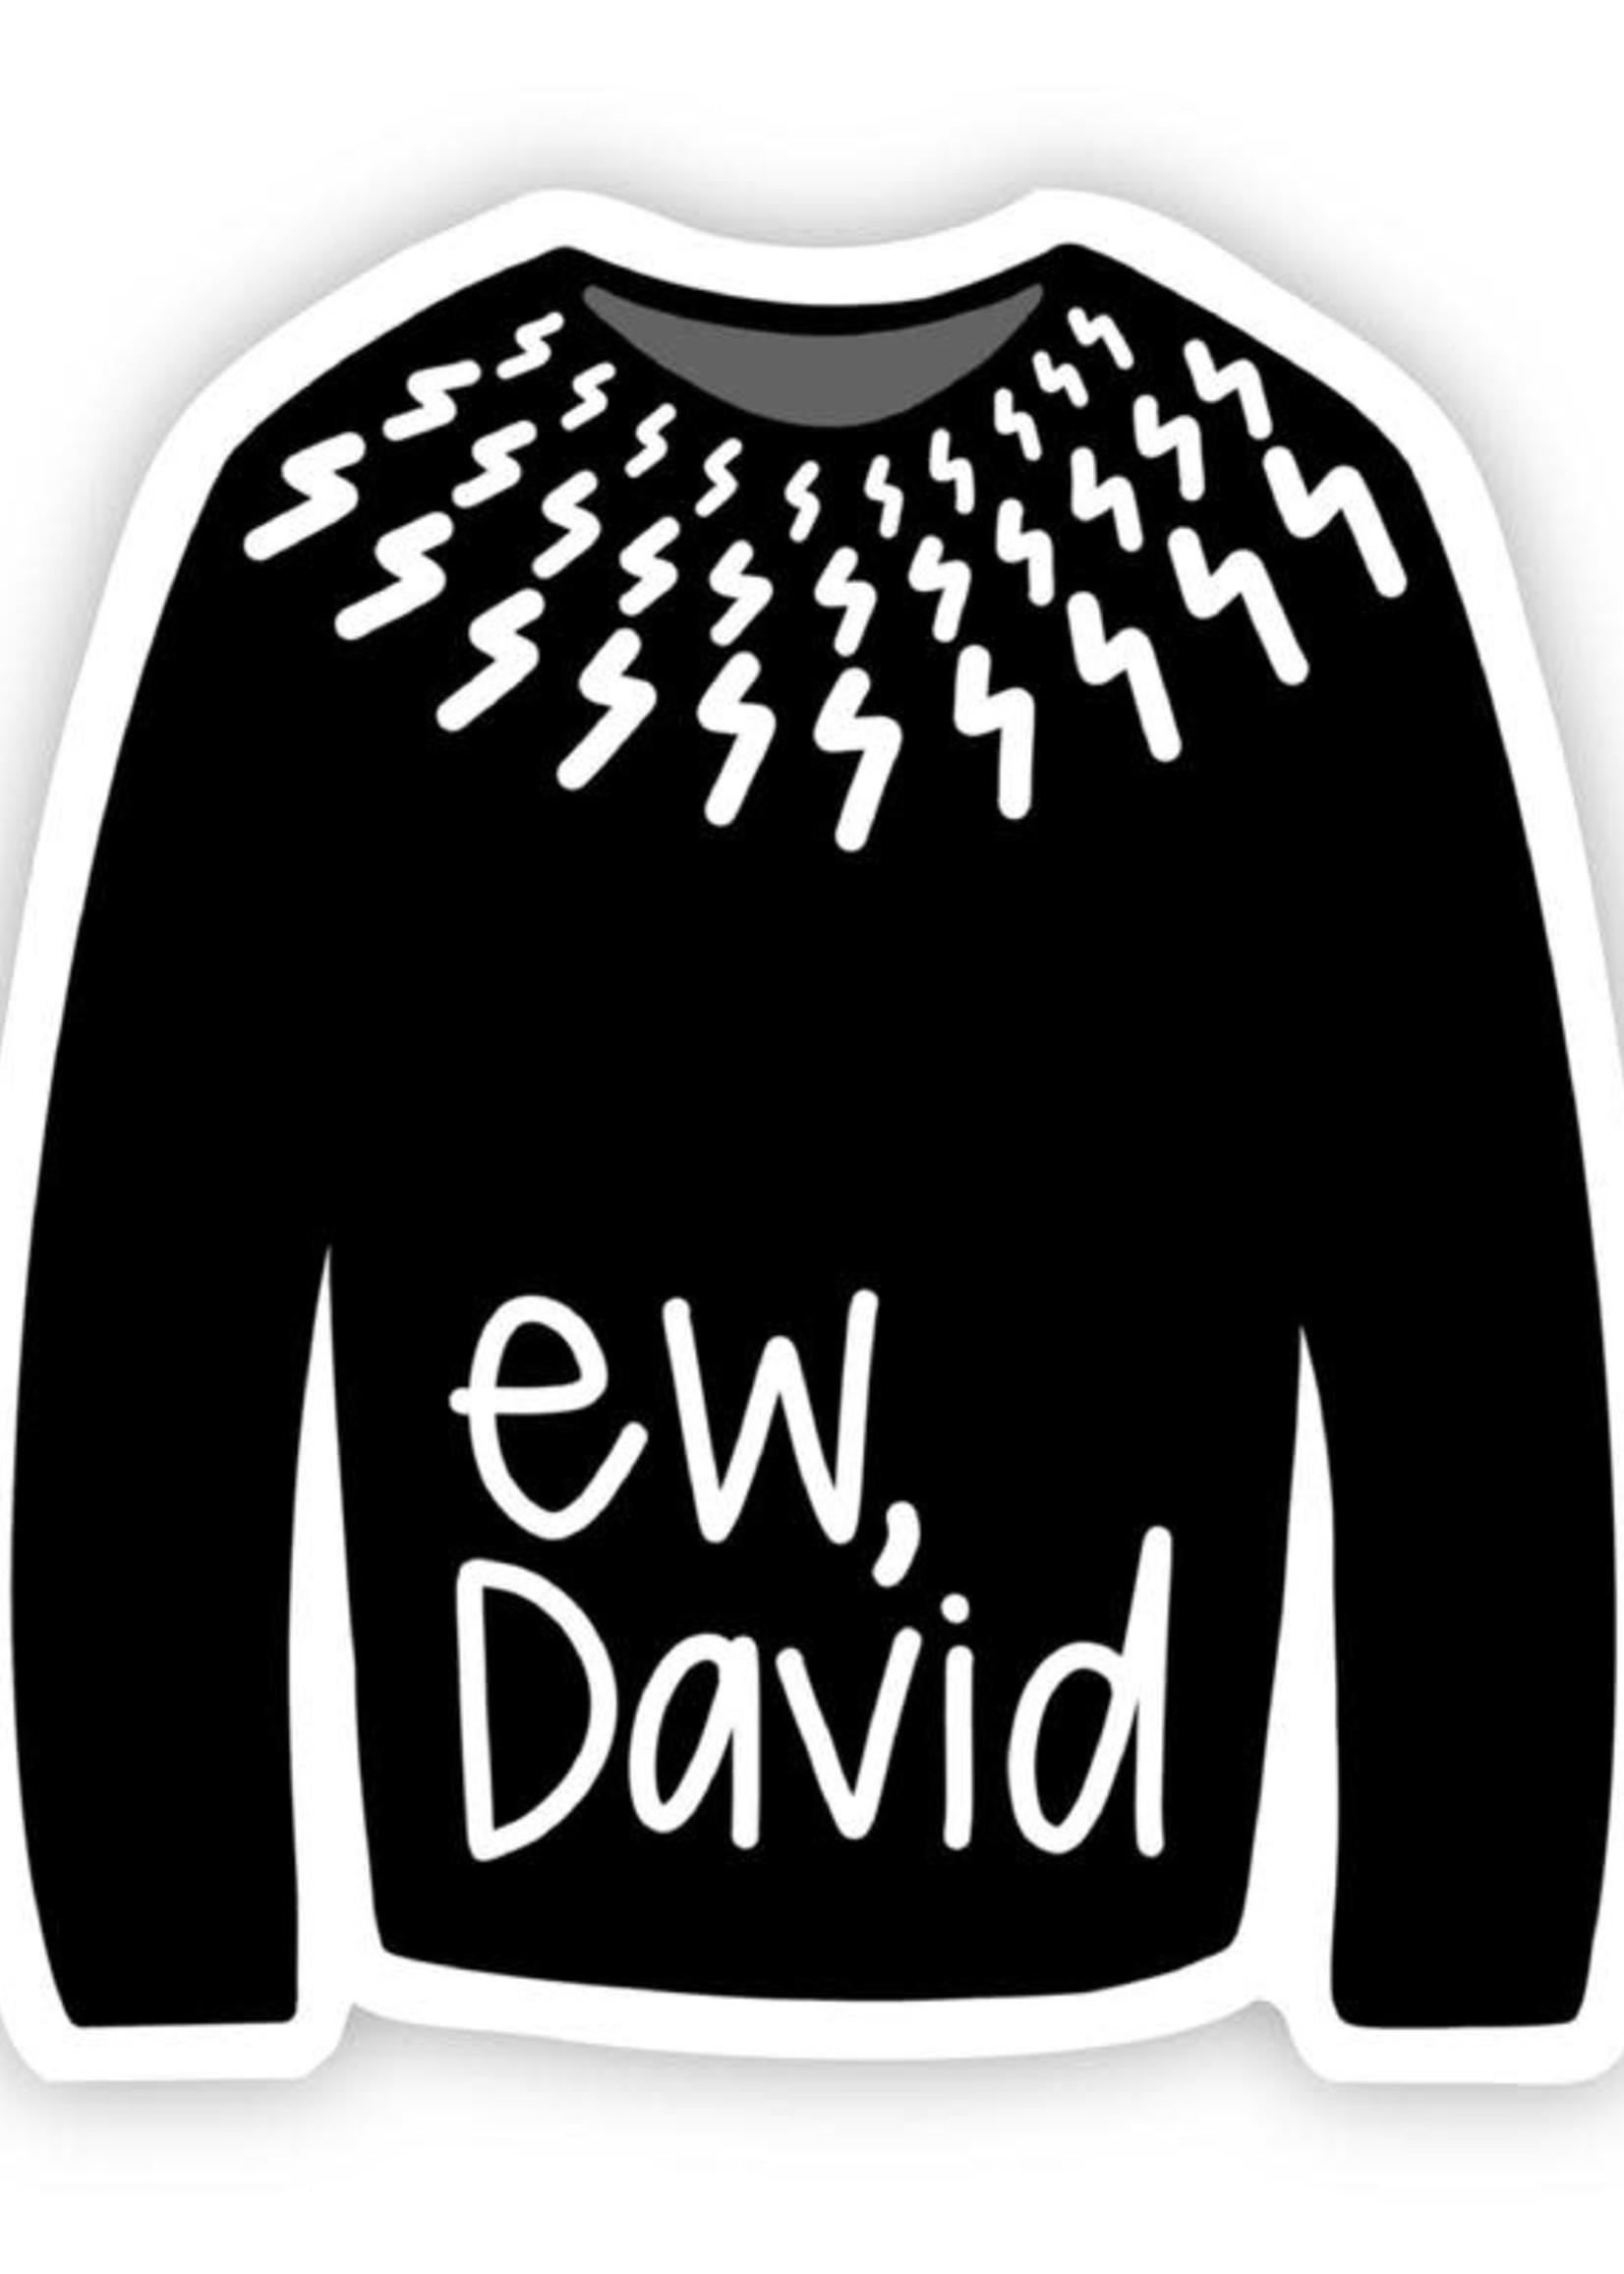 Ew, David Sweater Sticker